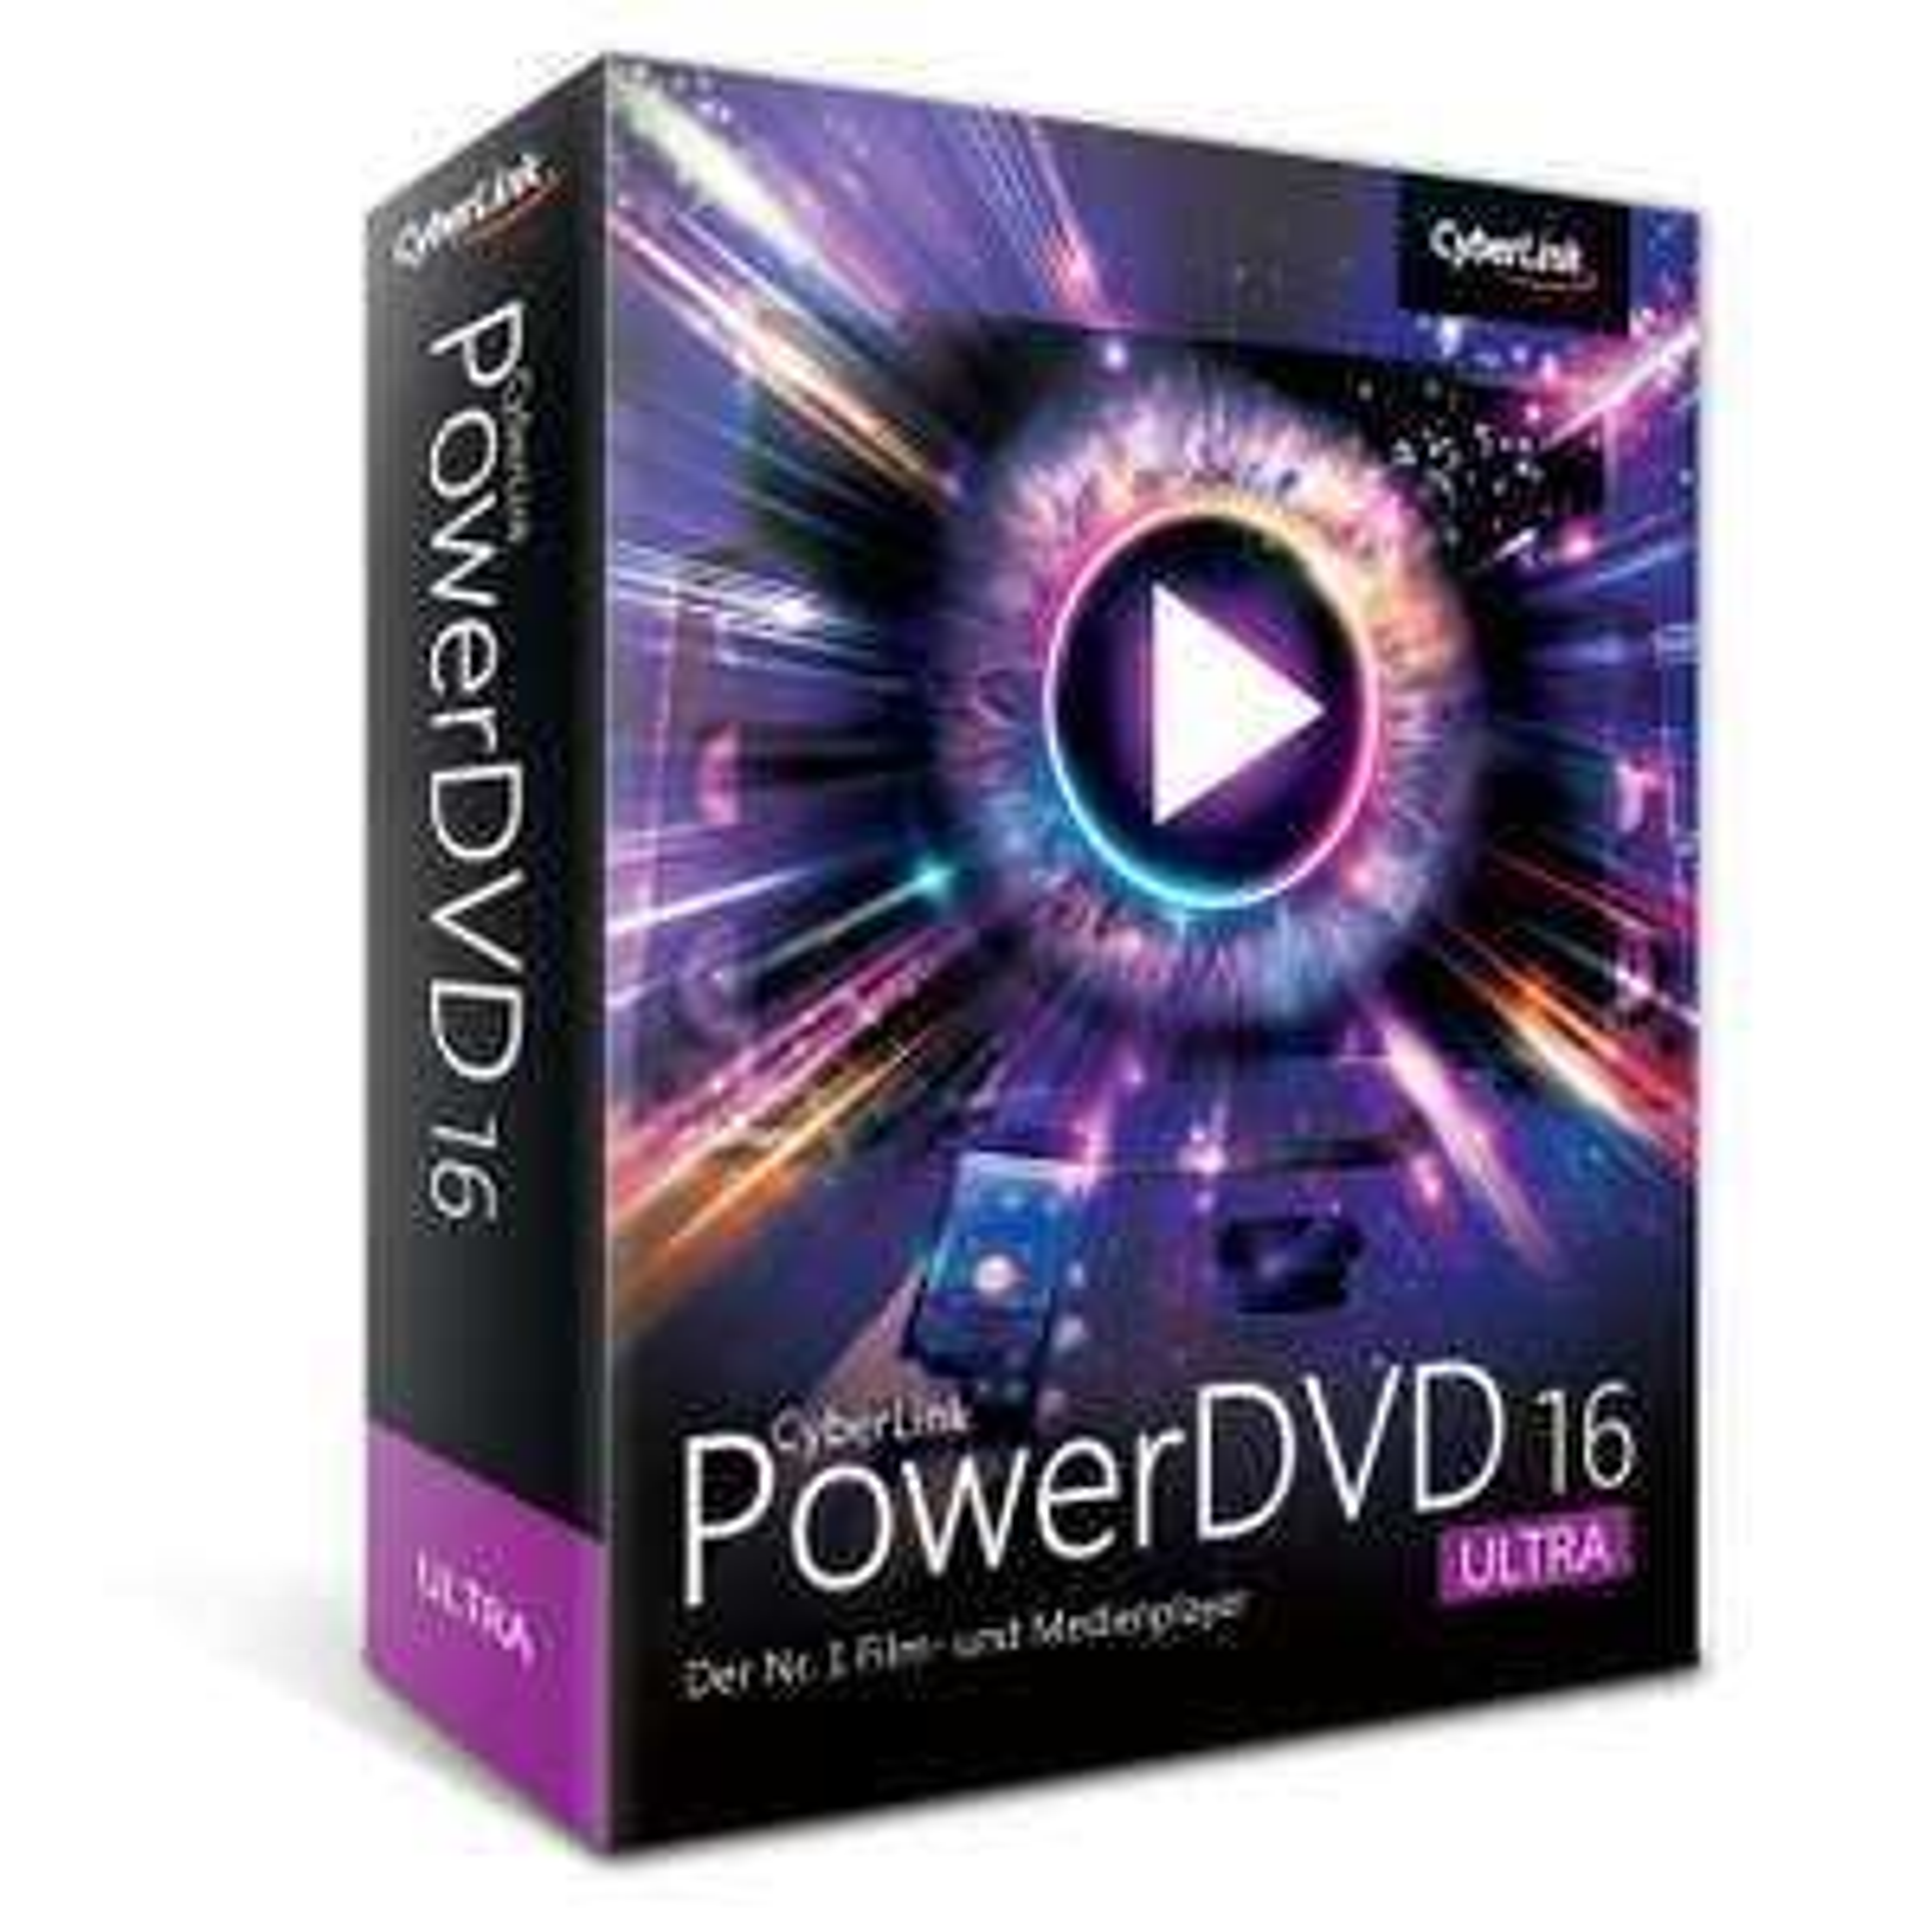 Cyberlink PowerDVD 16 Ultra + PhotoDirector 7, 8 Ultra + Power2Go 11 Platinum + MediaEspresso 7.5 etc.